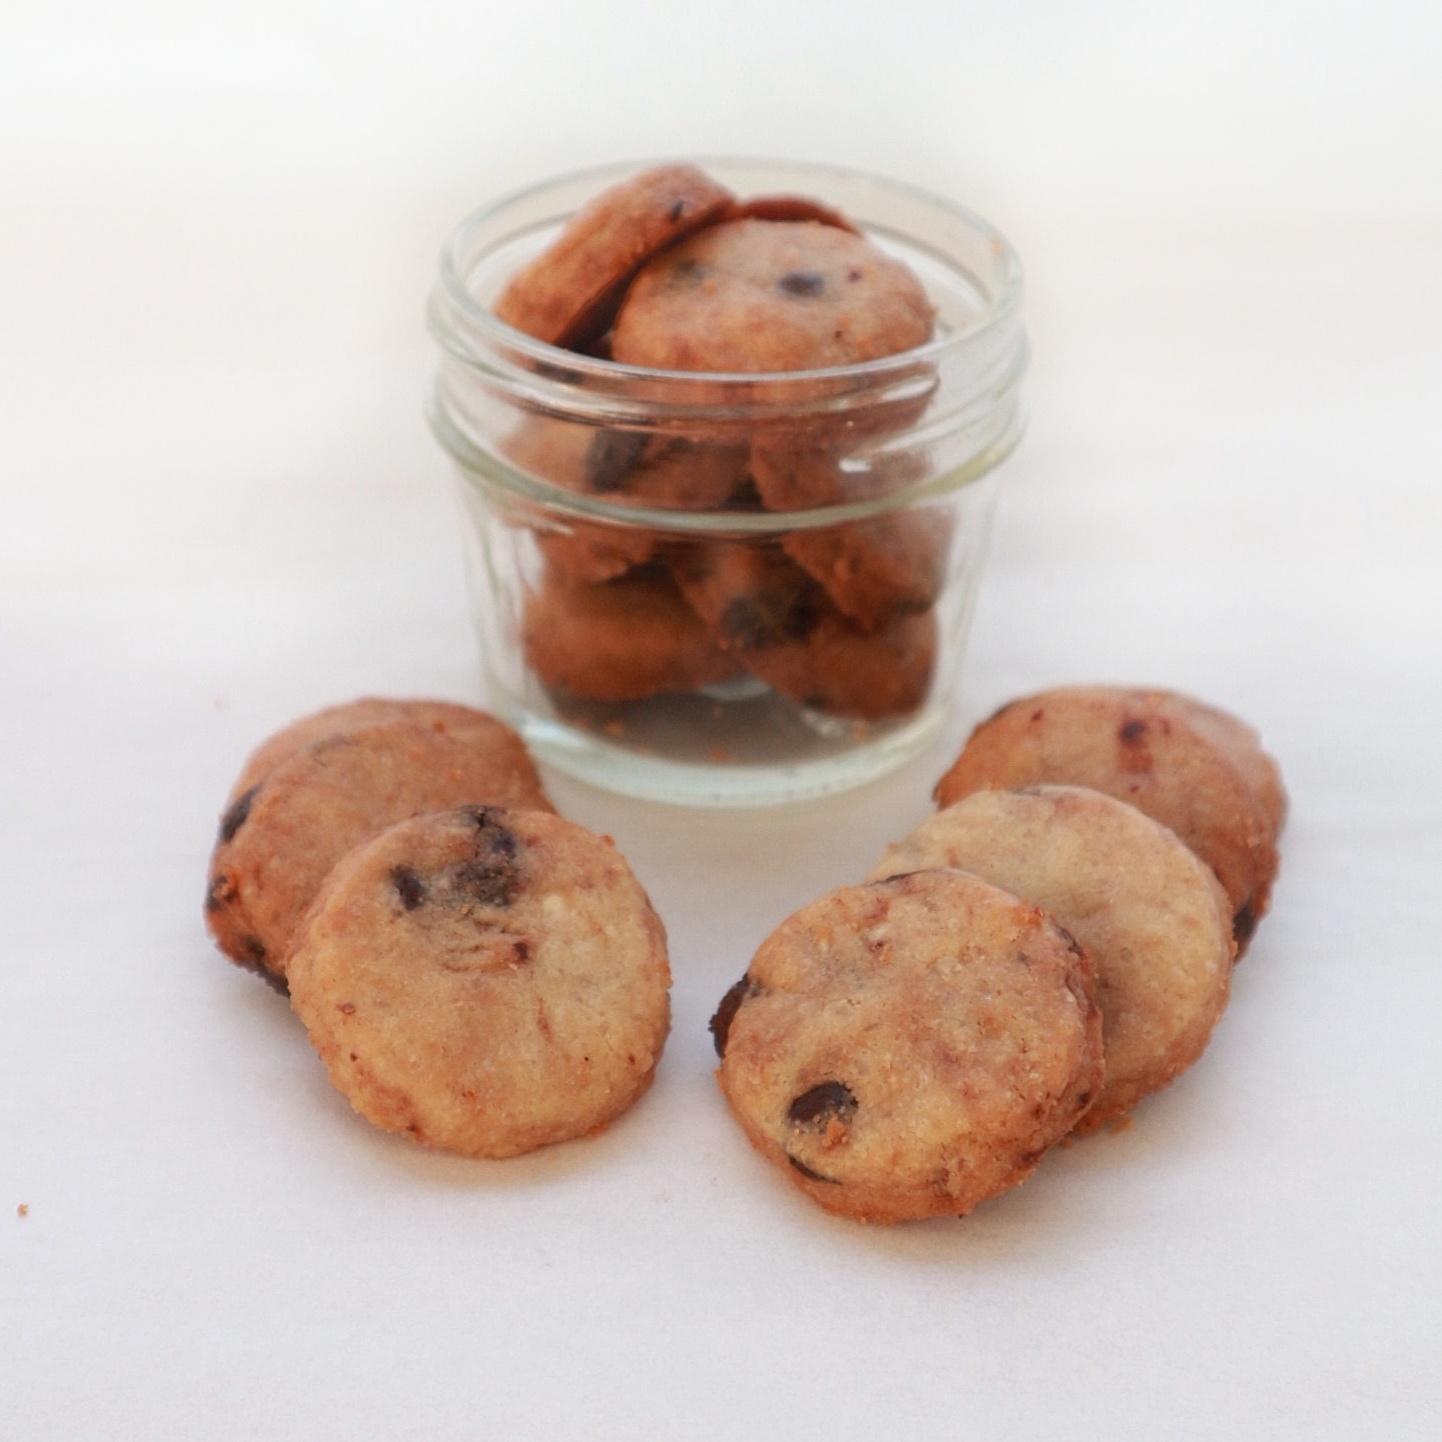 Choco Chip Cookies - Rp. 85.000,- / 100pcs